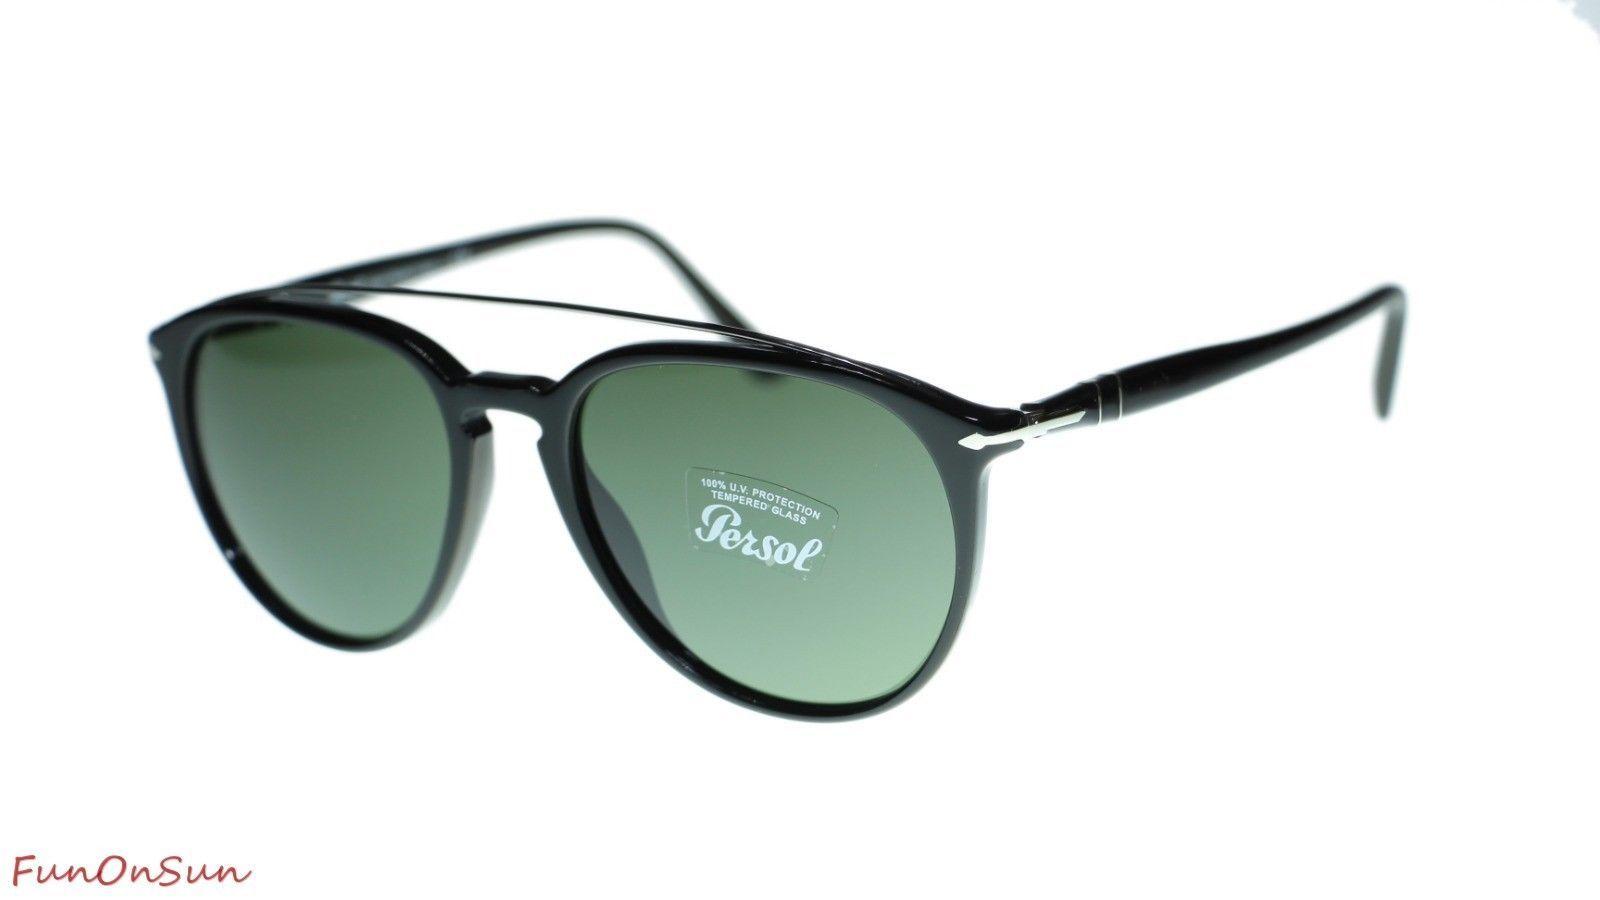 50b3c90bc4 Persol Mens Pilot Sunglasses PO3159S 901431 and similar items. 10